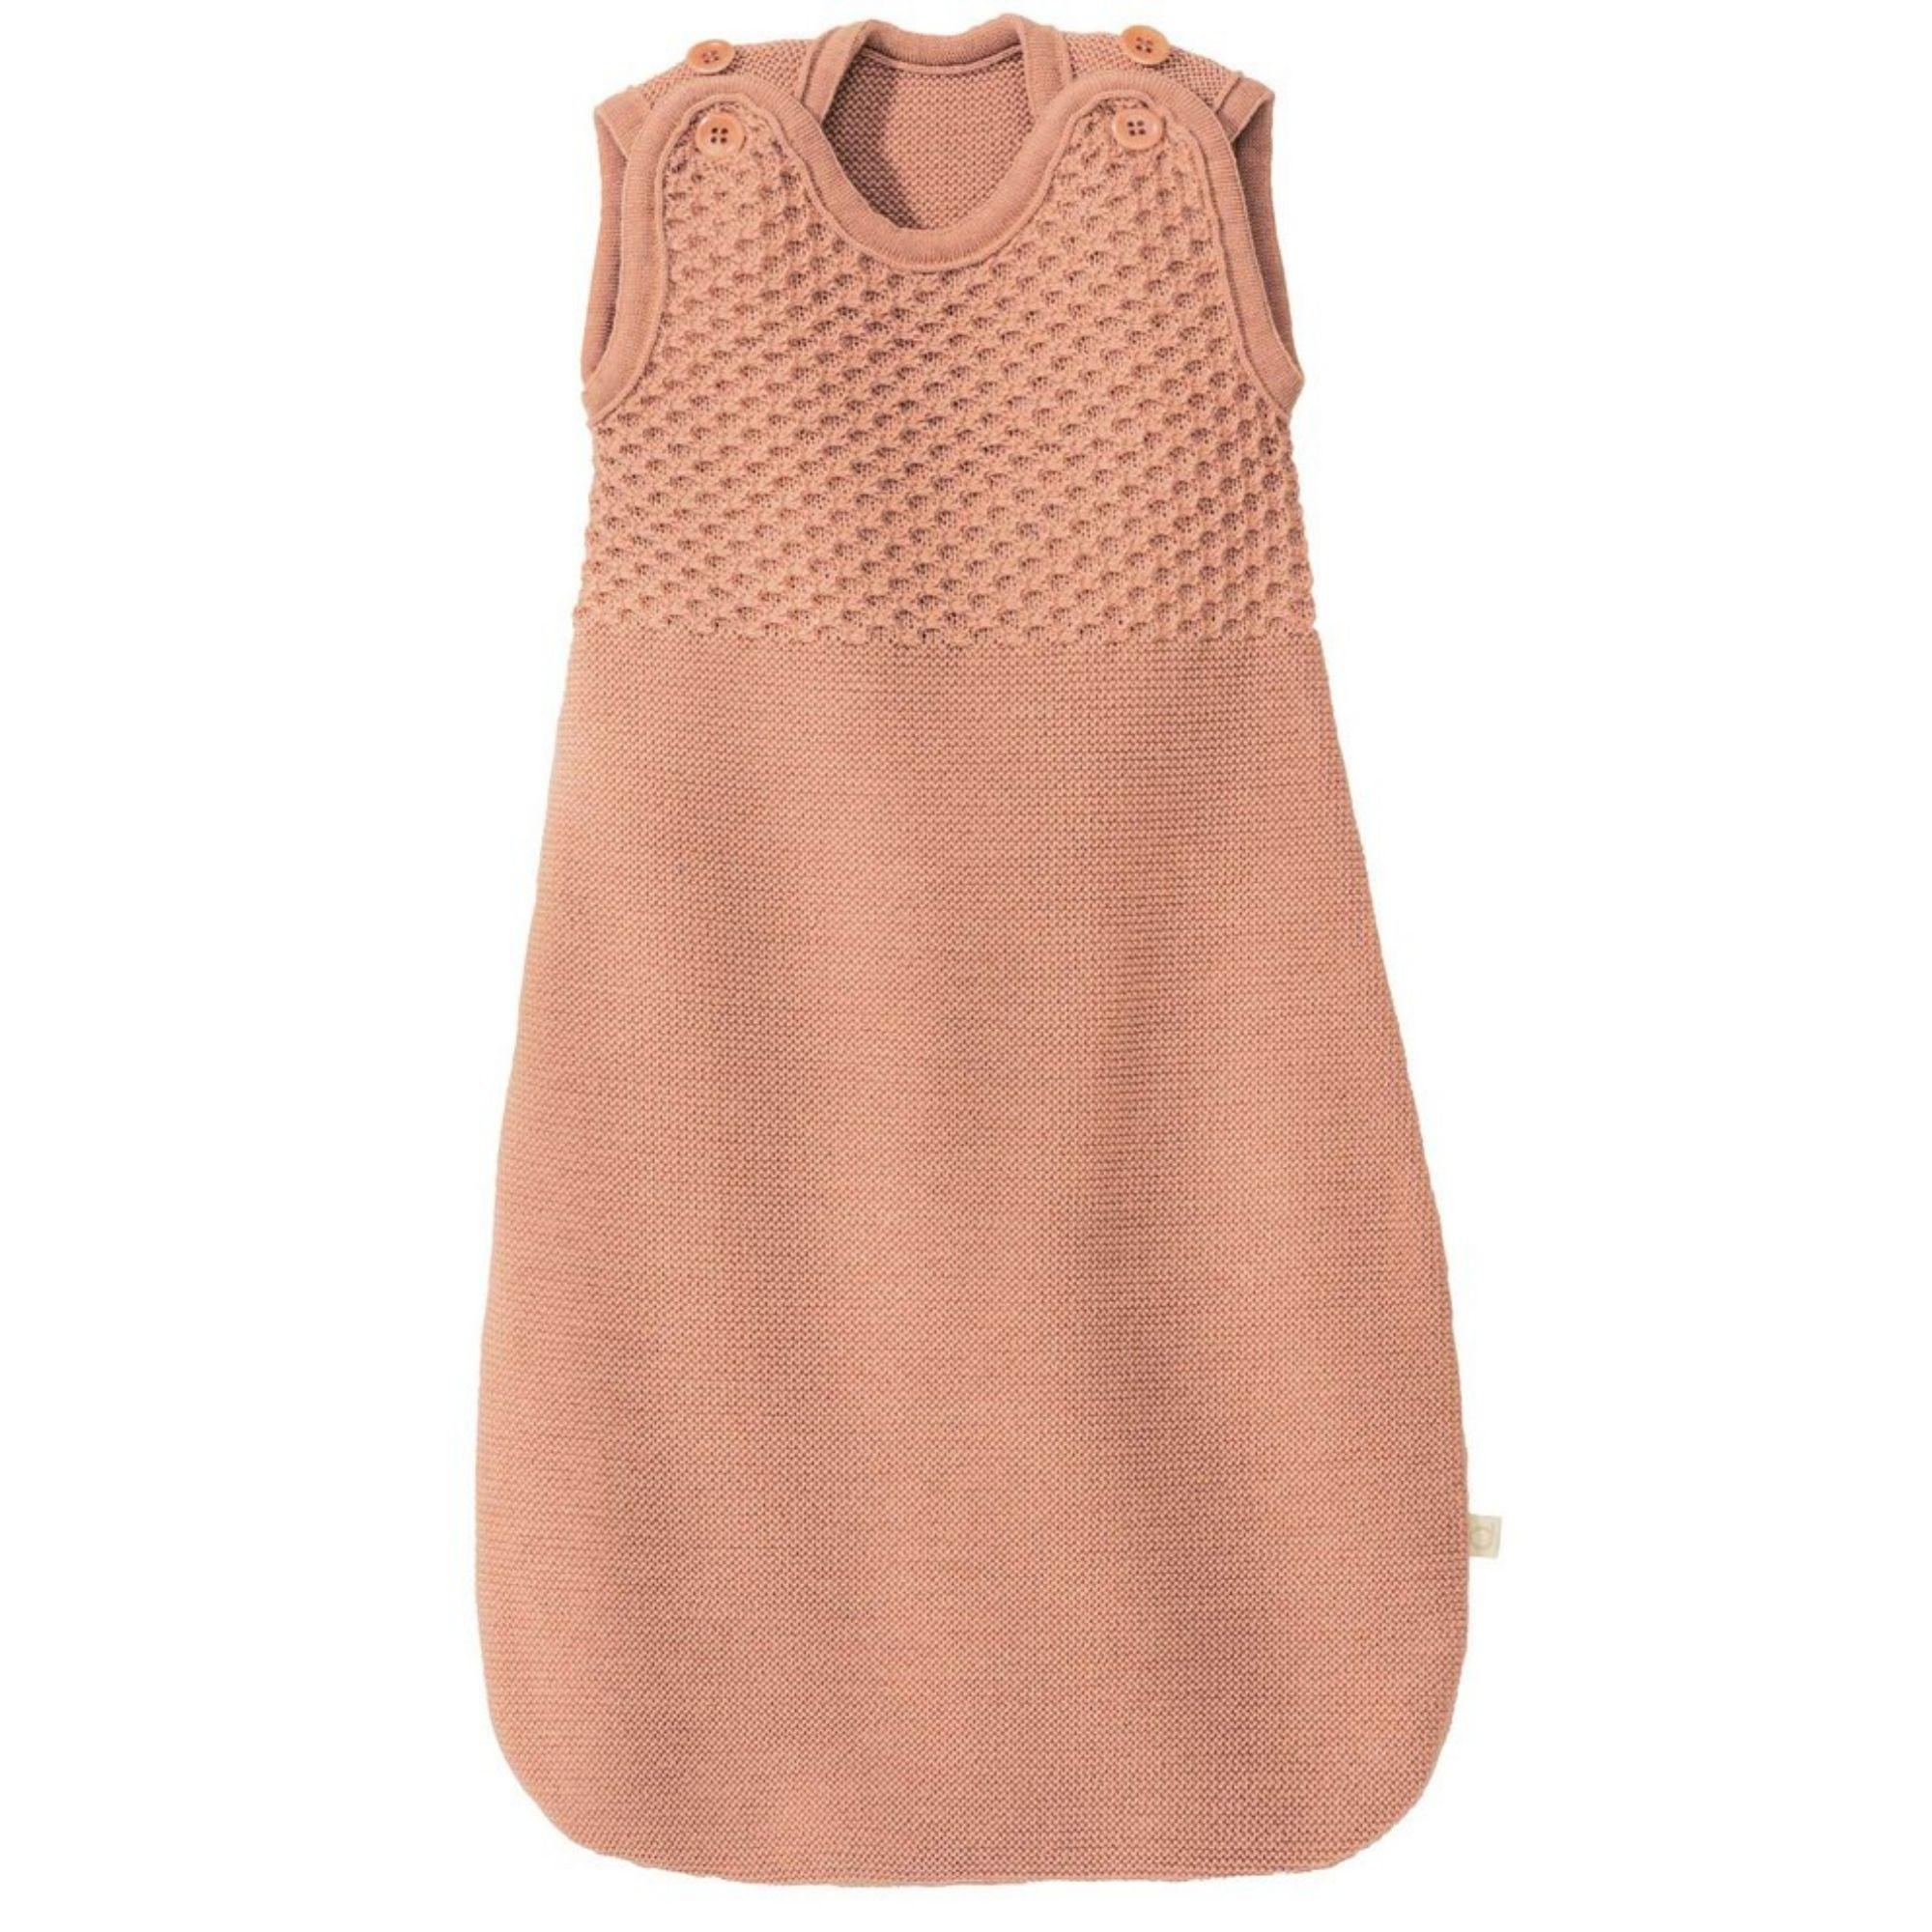 DISANA - Gigoteuse tricotée - Laine mérinos - ROSE